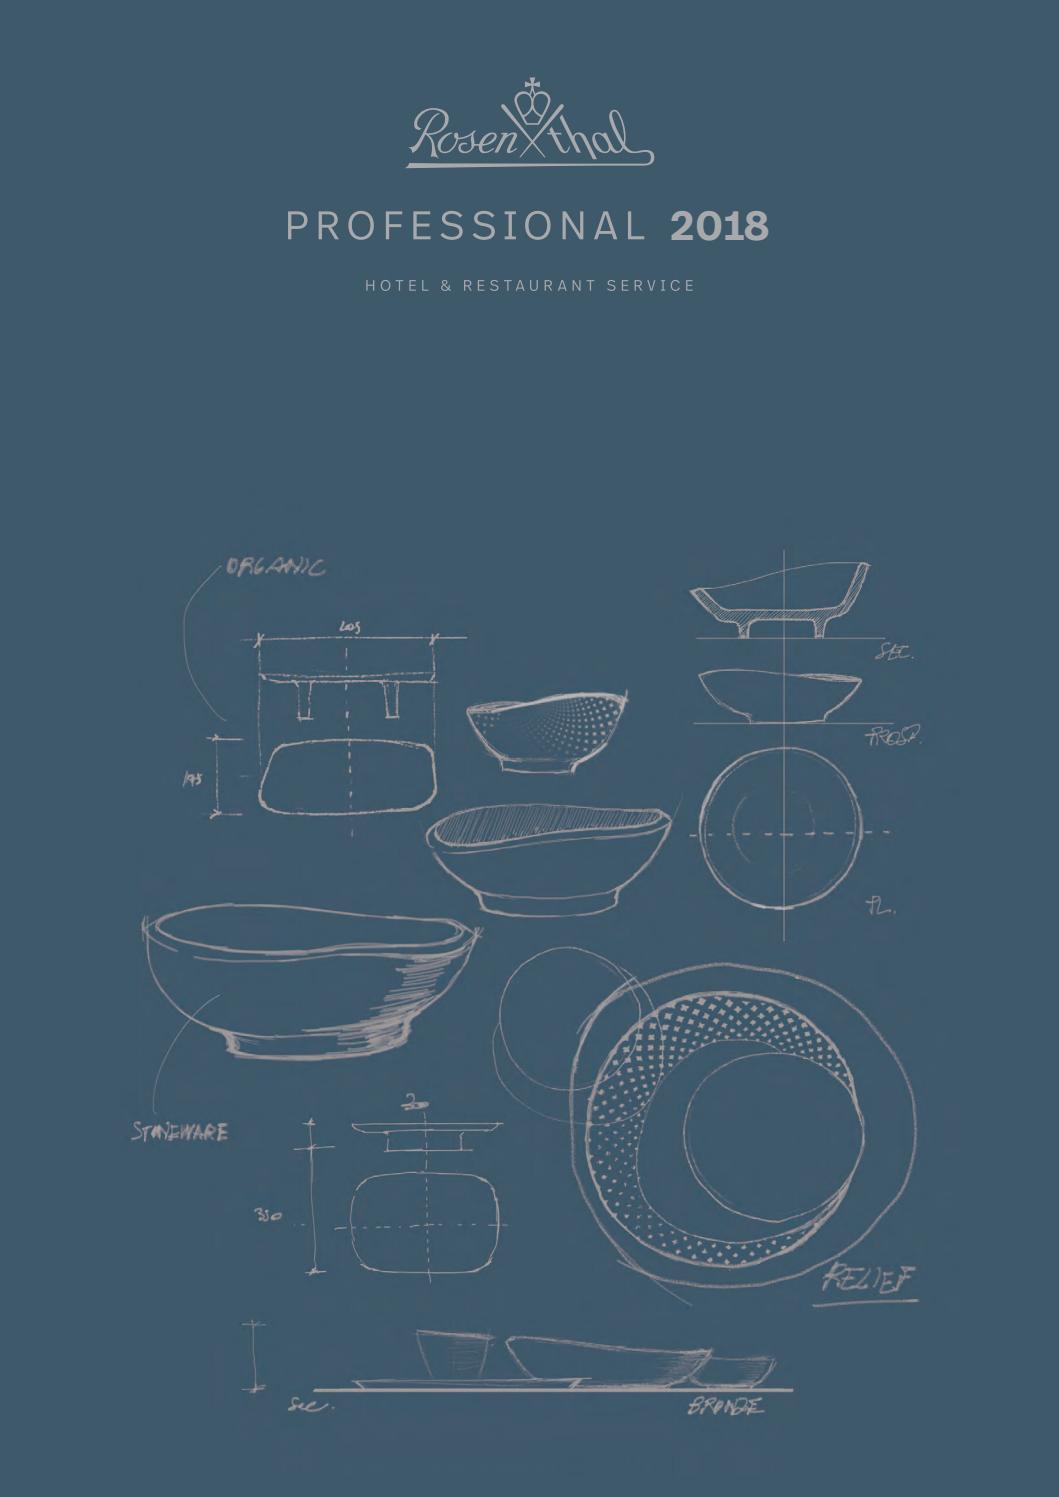 Vetrine E Alzate Moderne Design.Rosenthal 2018 By Establecimientos Alvarez Mallorca S A Issuu